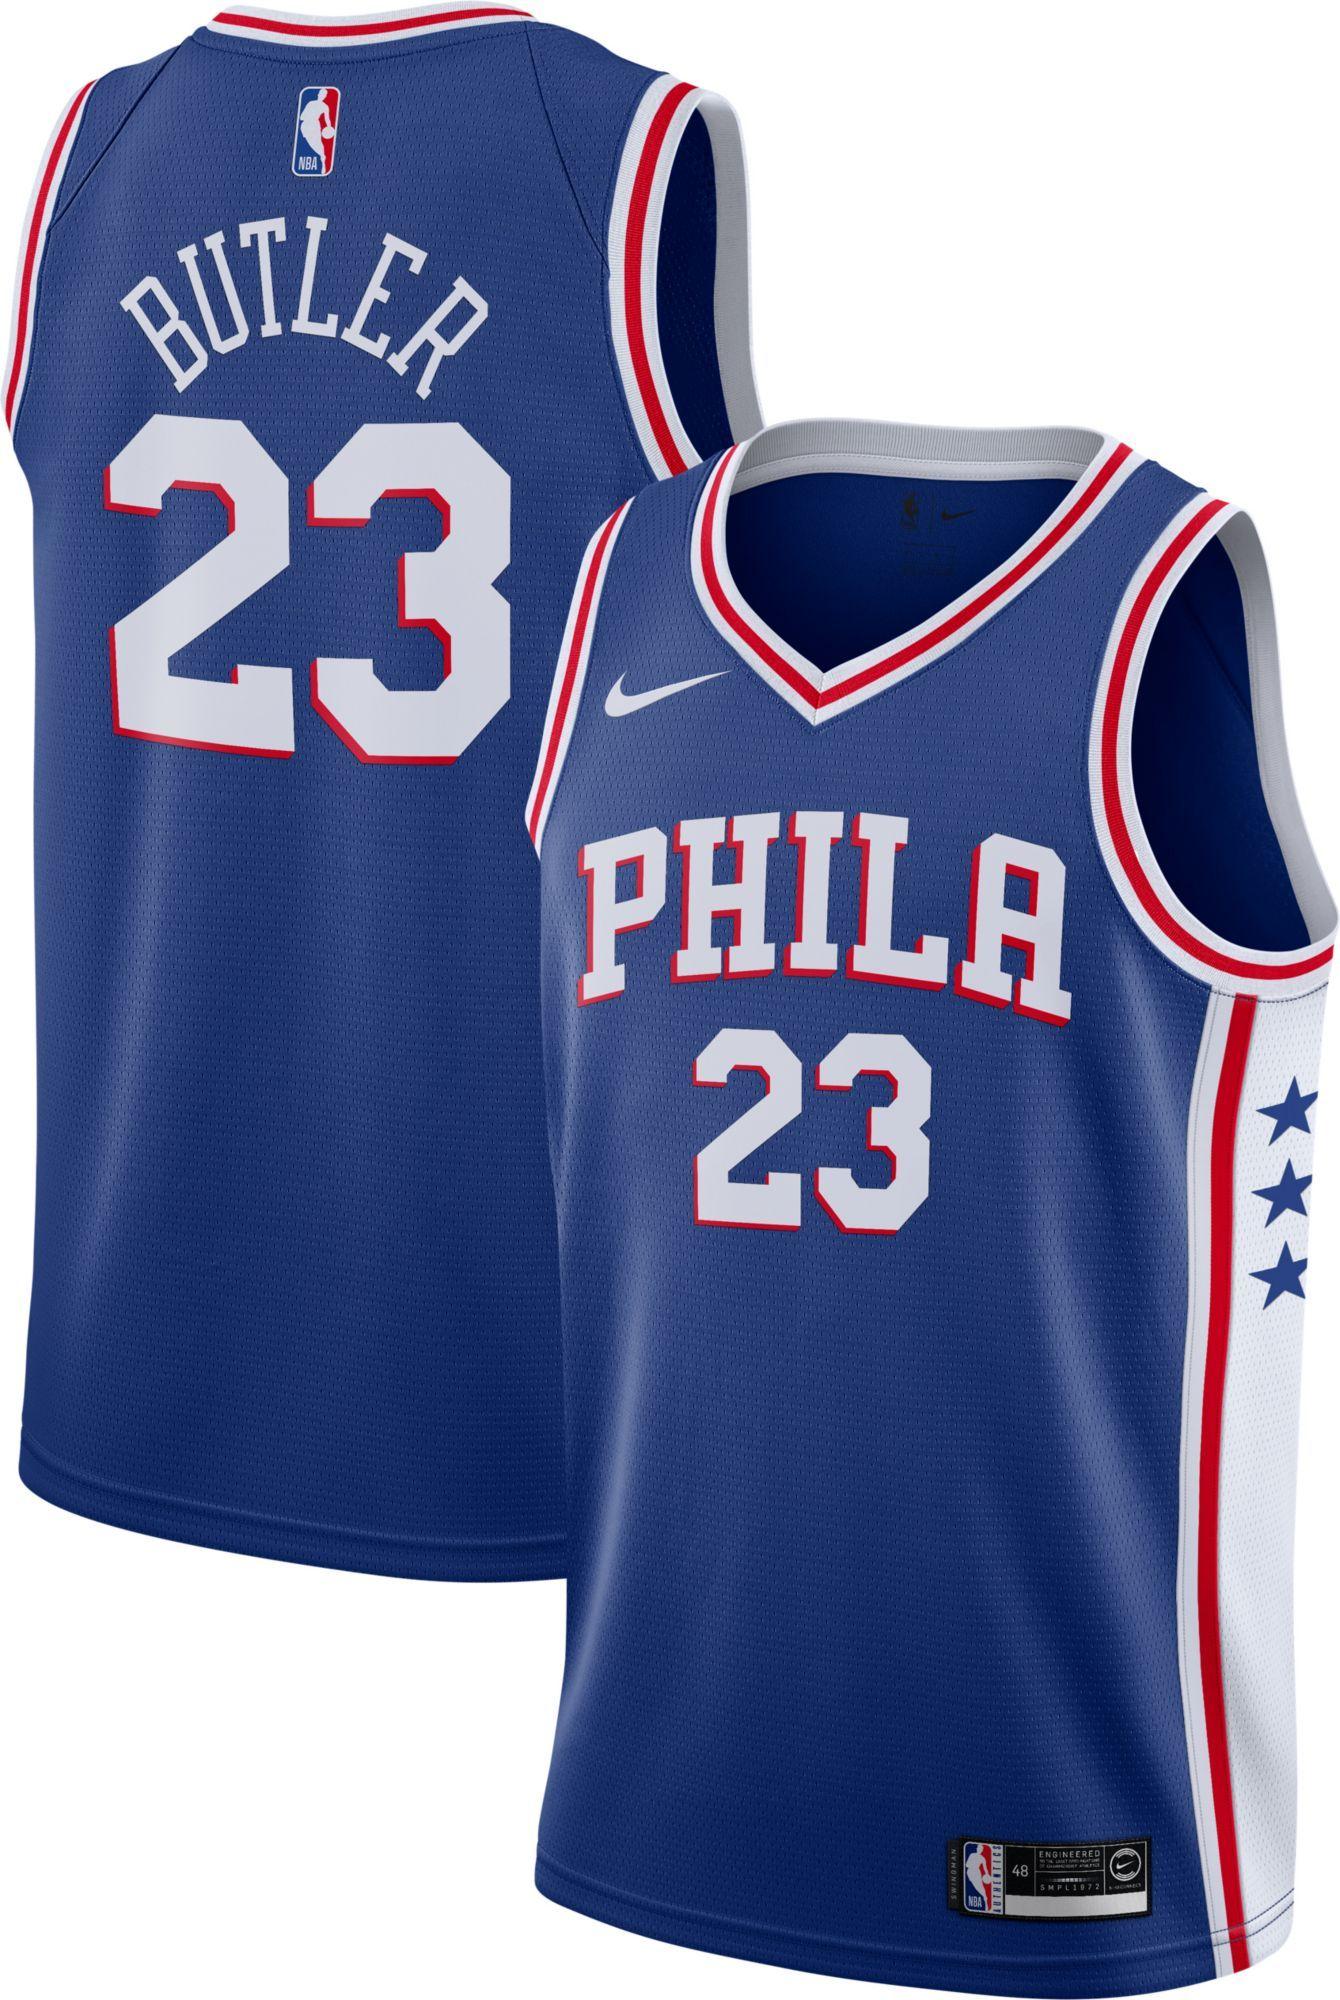 c4b3f5ab80ae Nike Men s Philadelphia 76ers Jimmy Butler  23 Royal Dri-FIT Swingman  Jersey